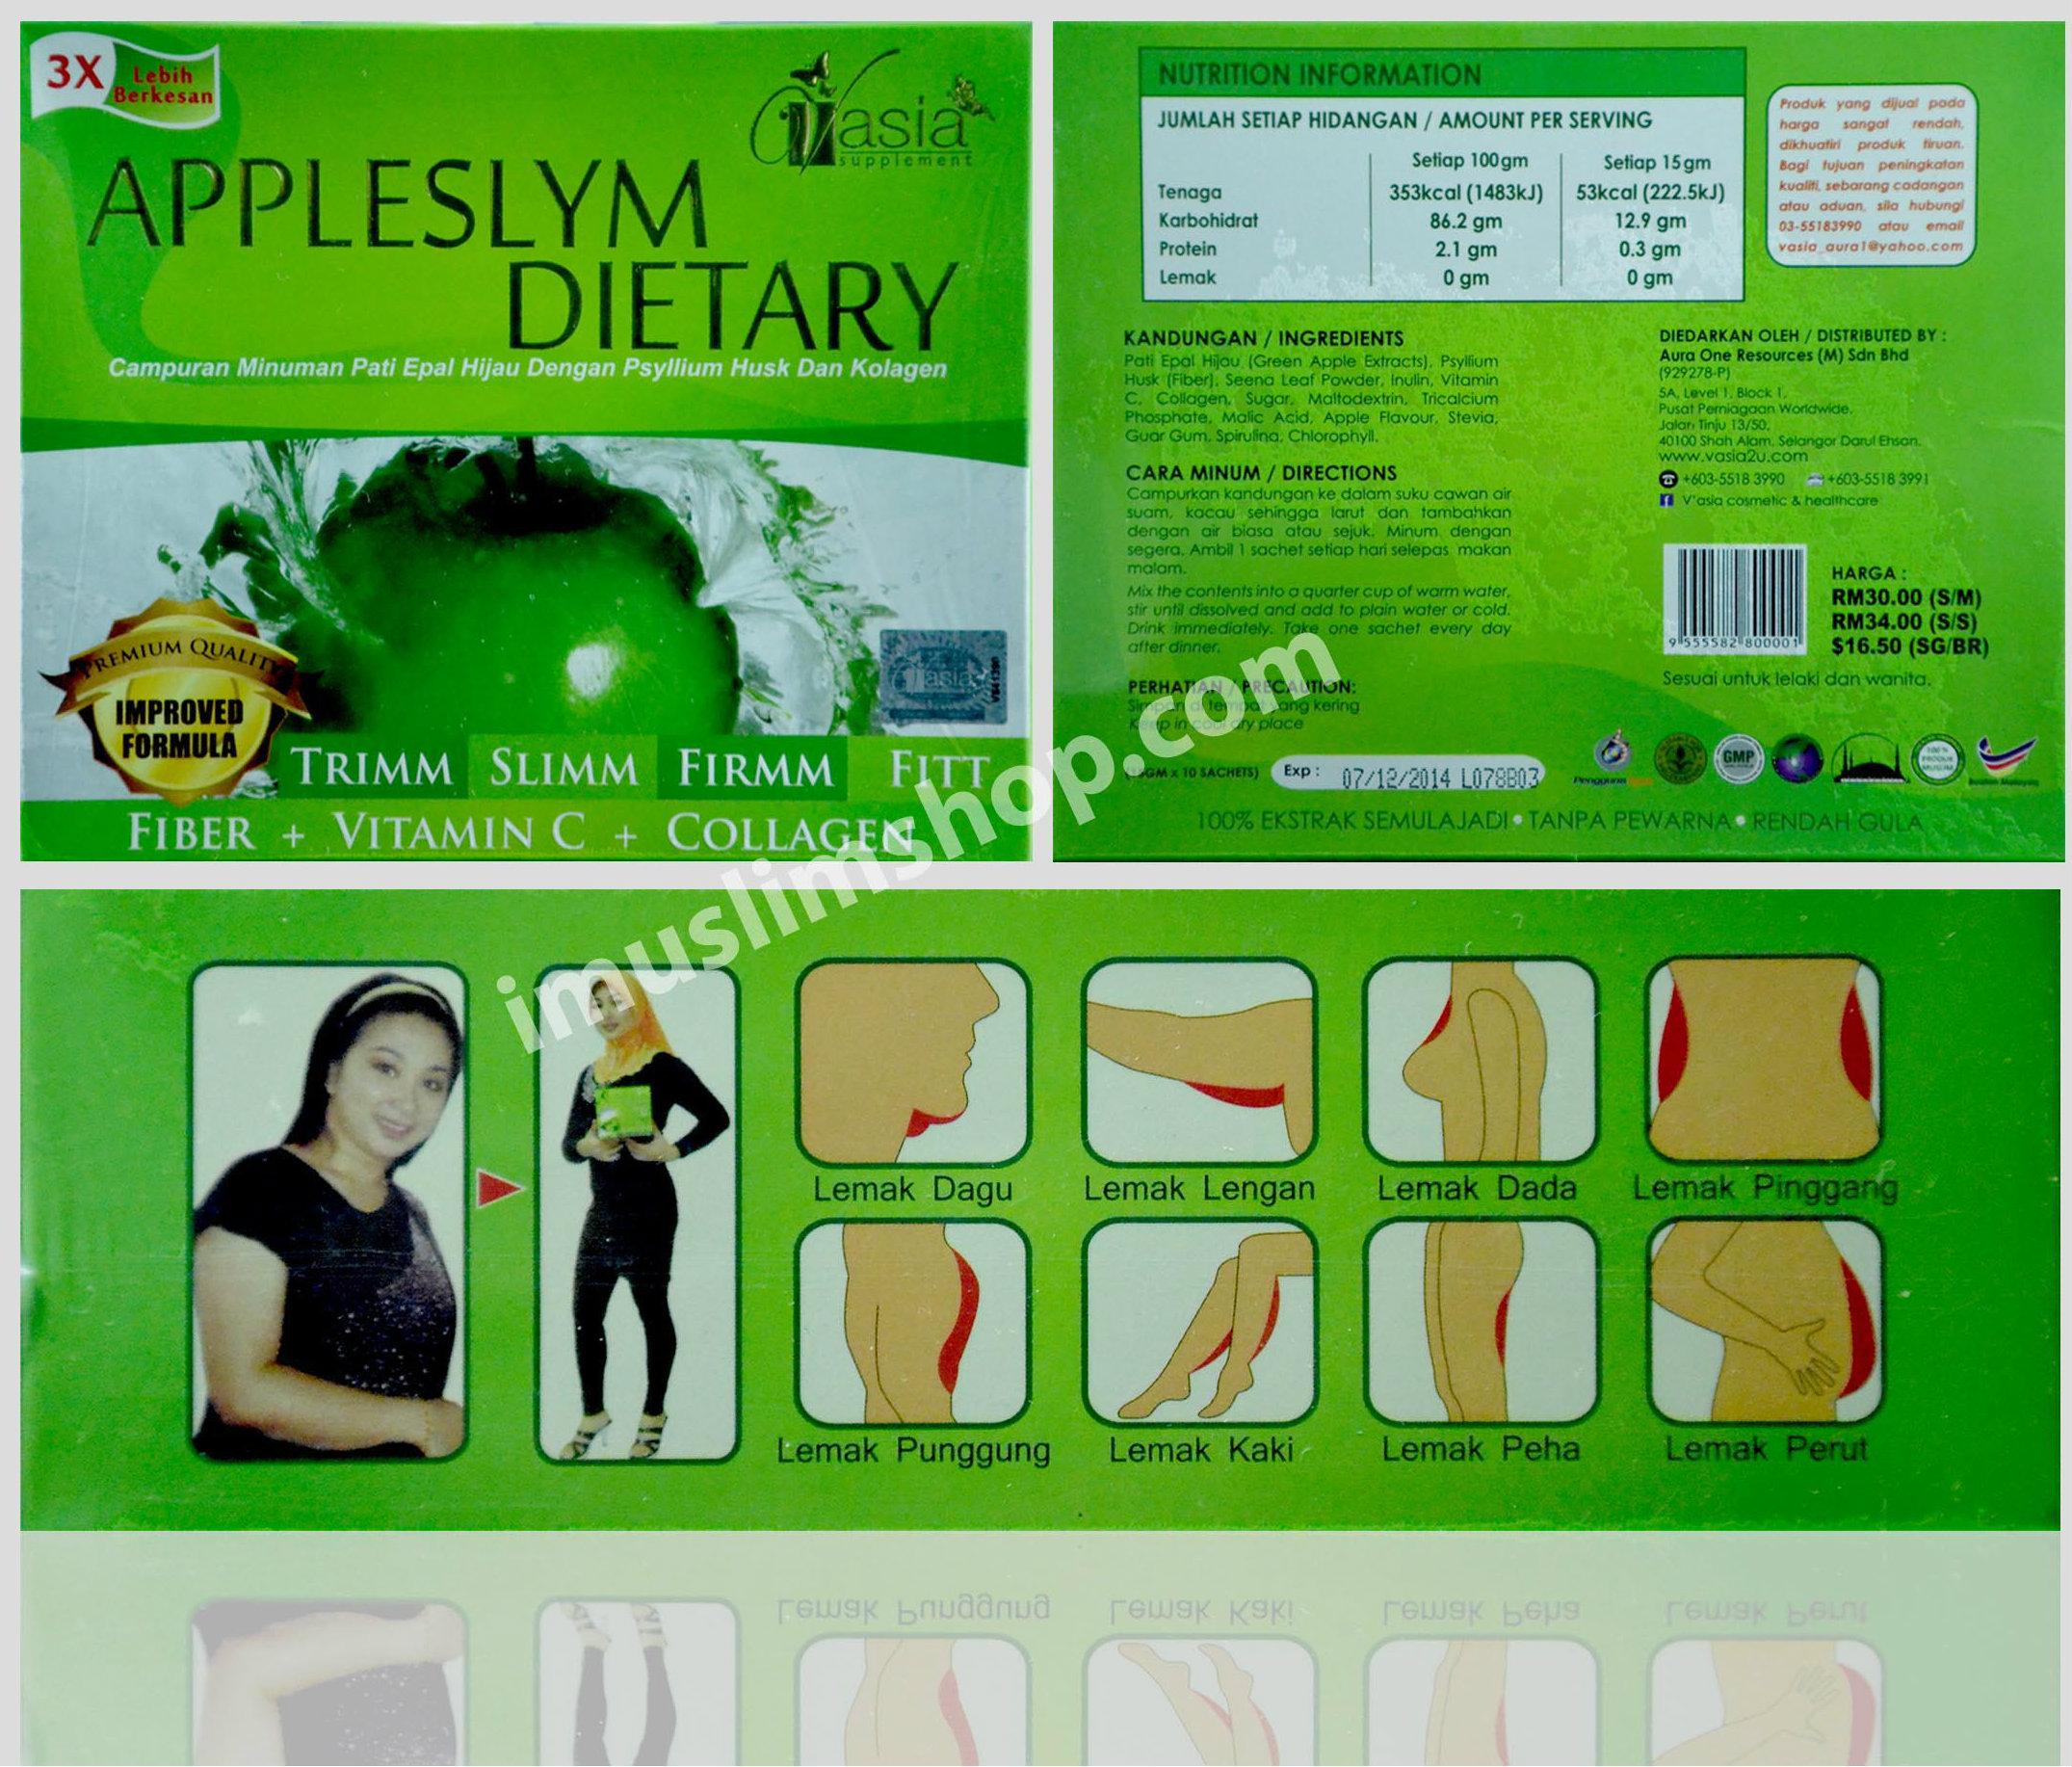 Appleslym Dietary V'ASIA | imuslim